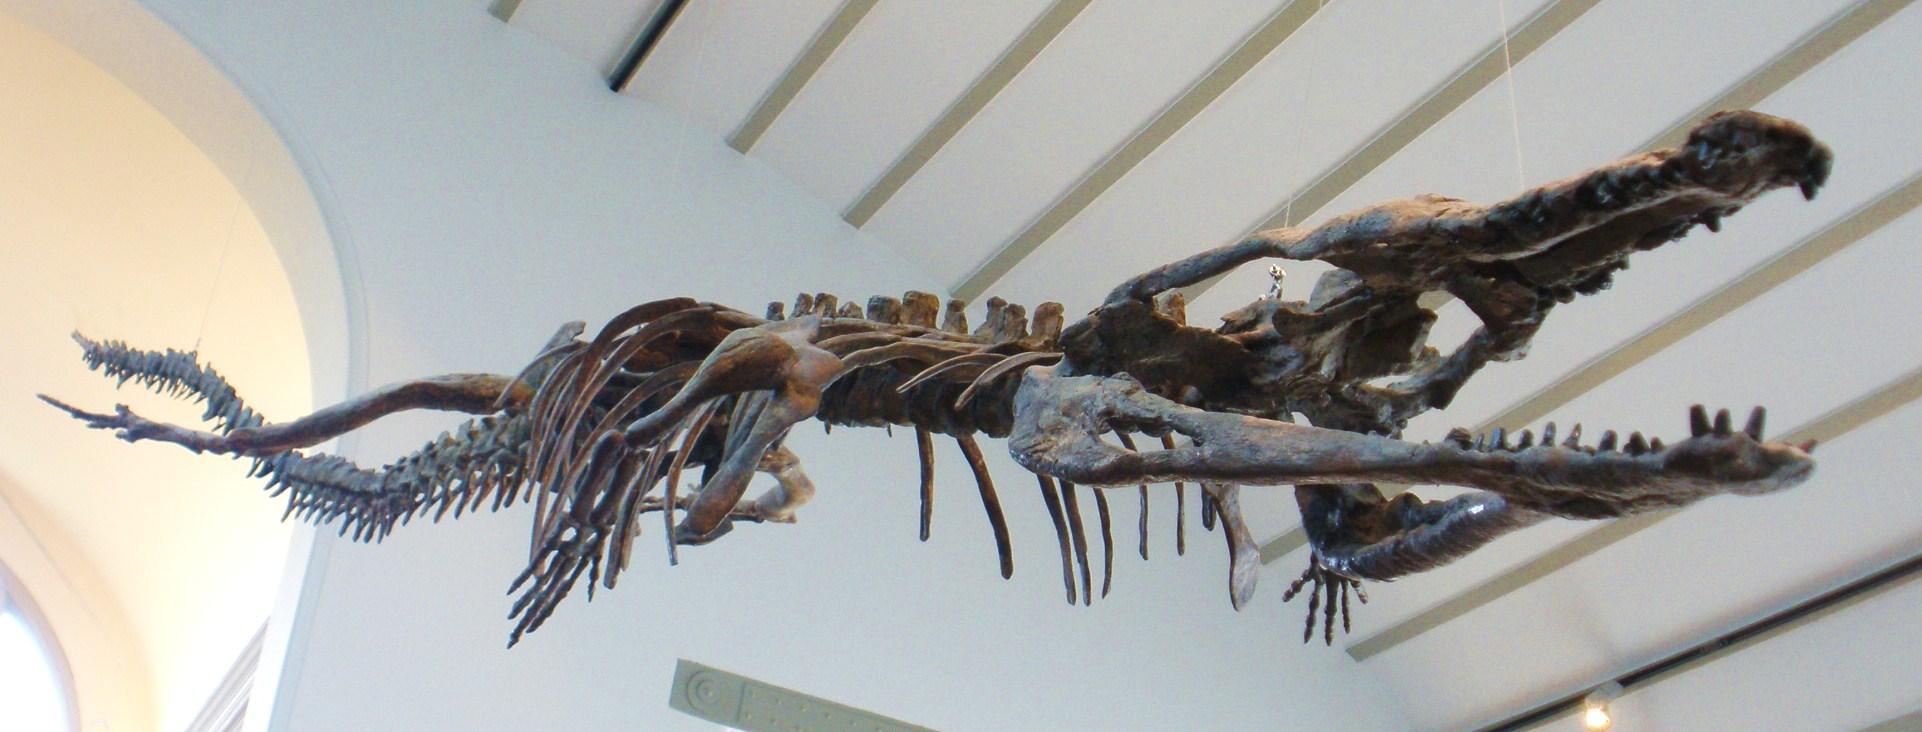 Machimosaurus_sp.jpg